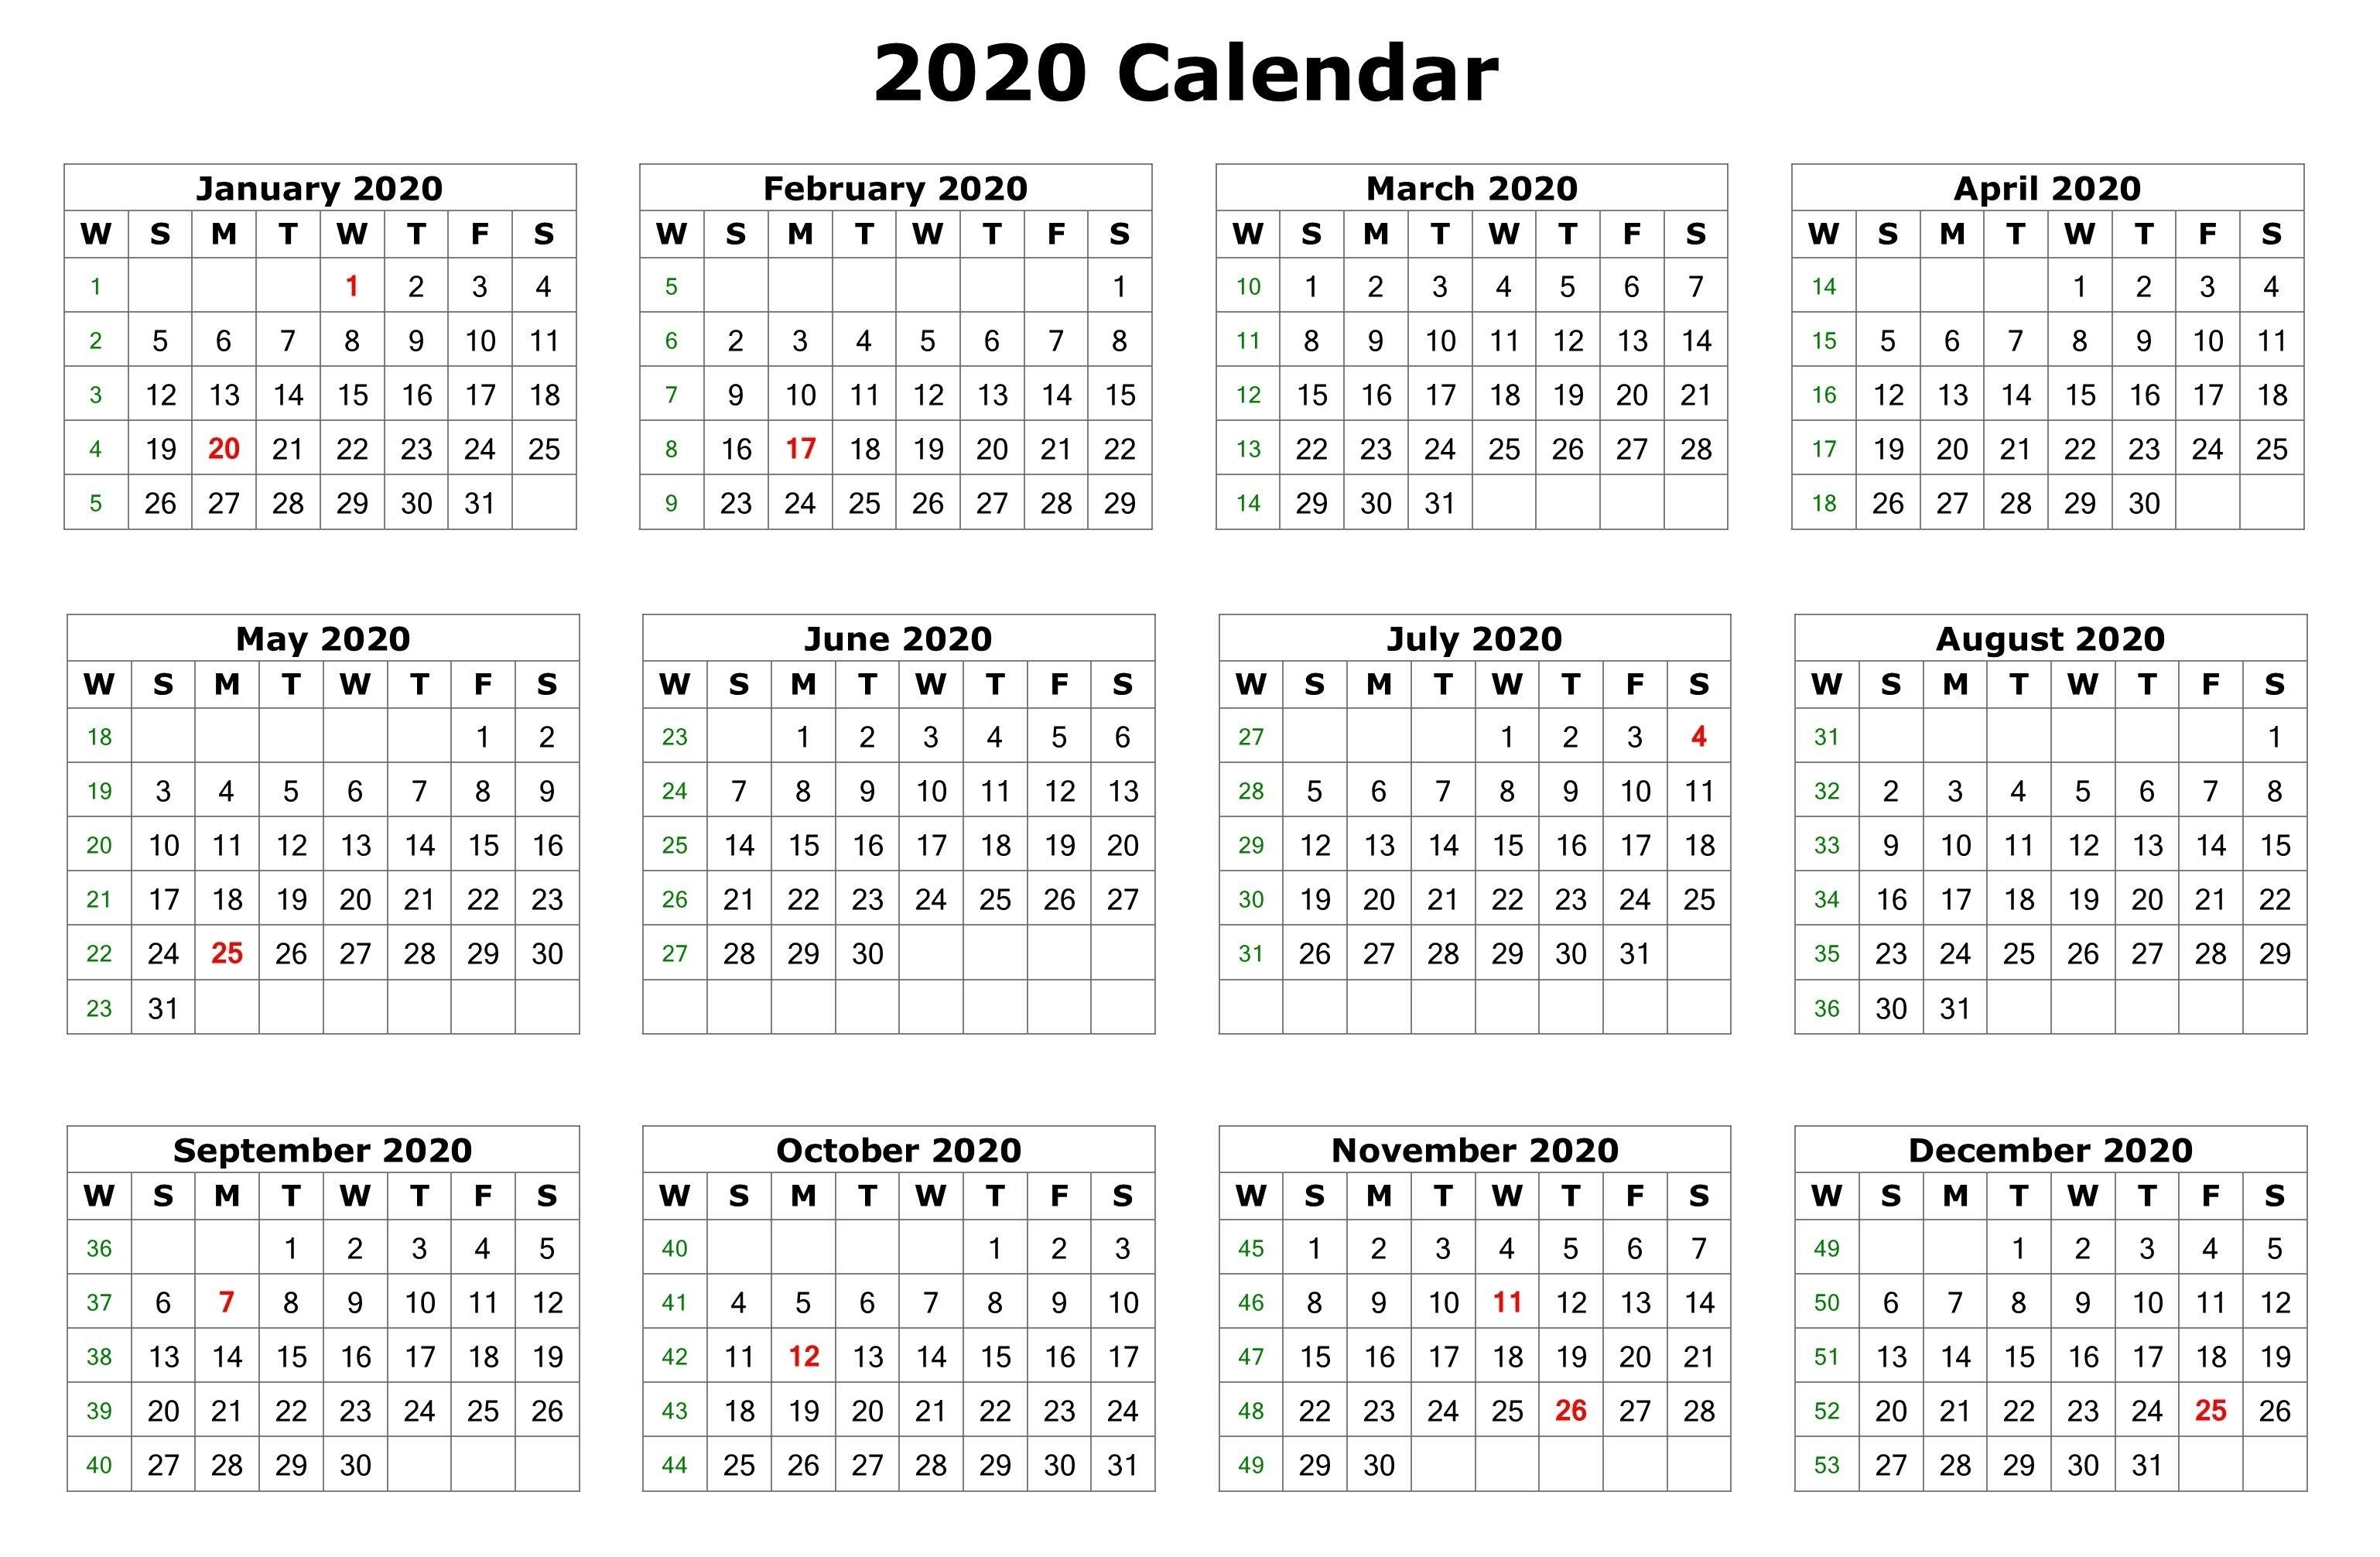 2020 12 Months Calendar Printable   2020 Calendars-2022 Calendar Printable With Holidays Malaysia